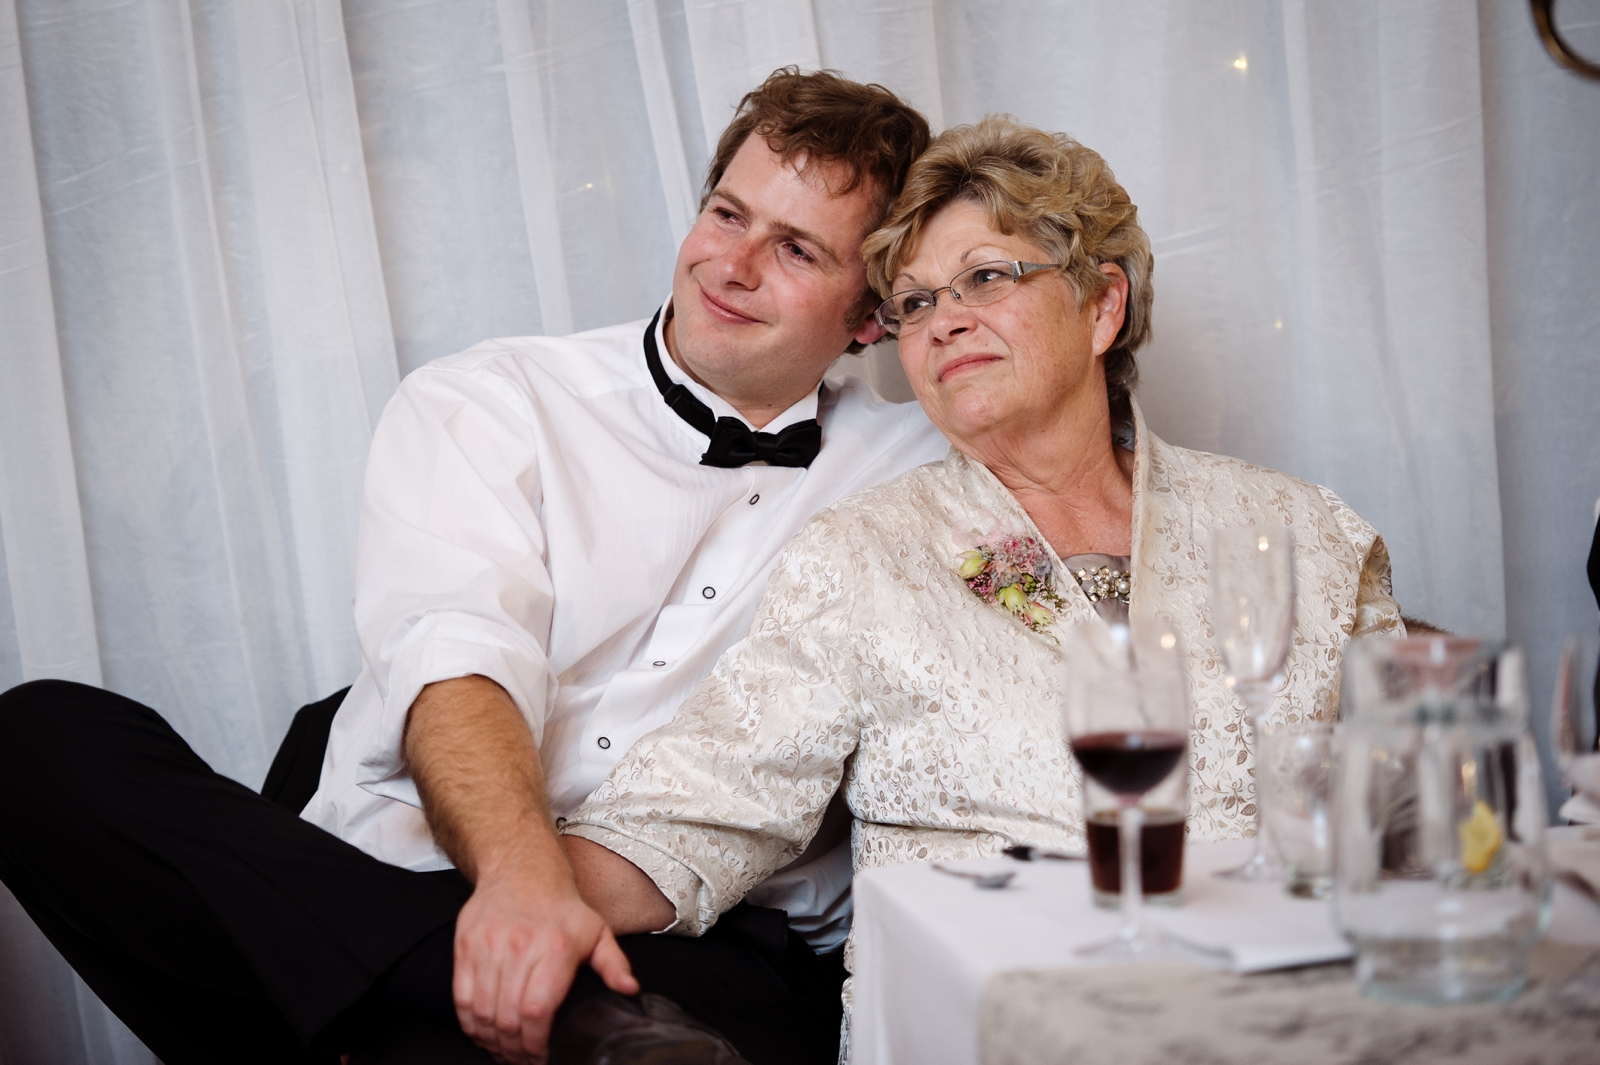 mom and son at wedding